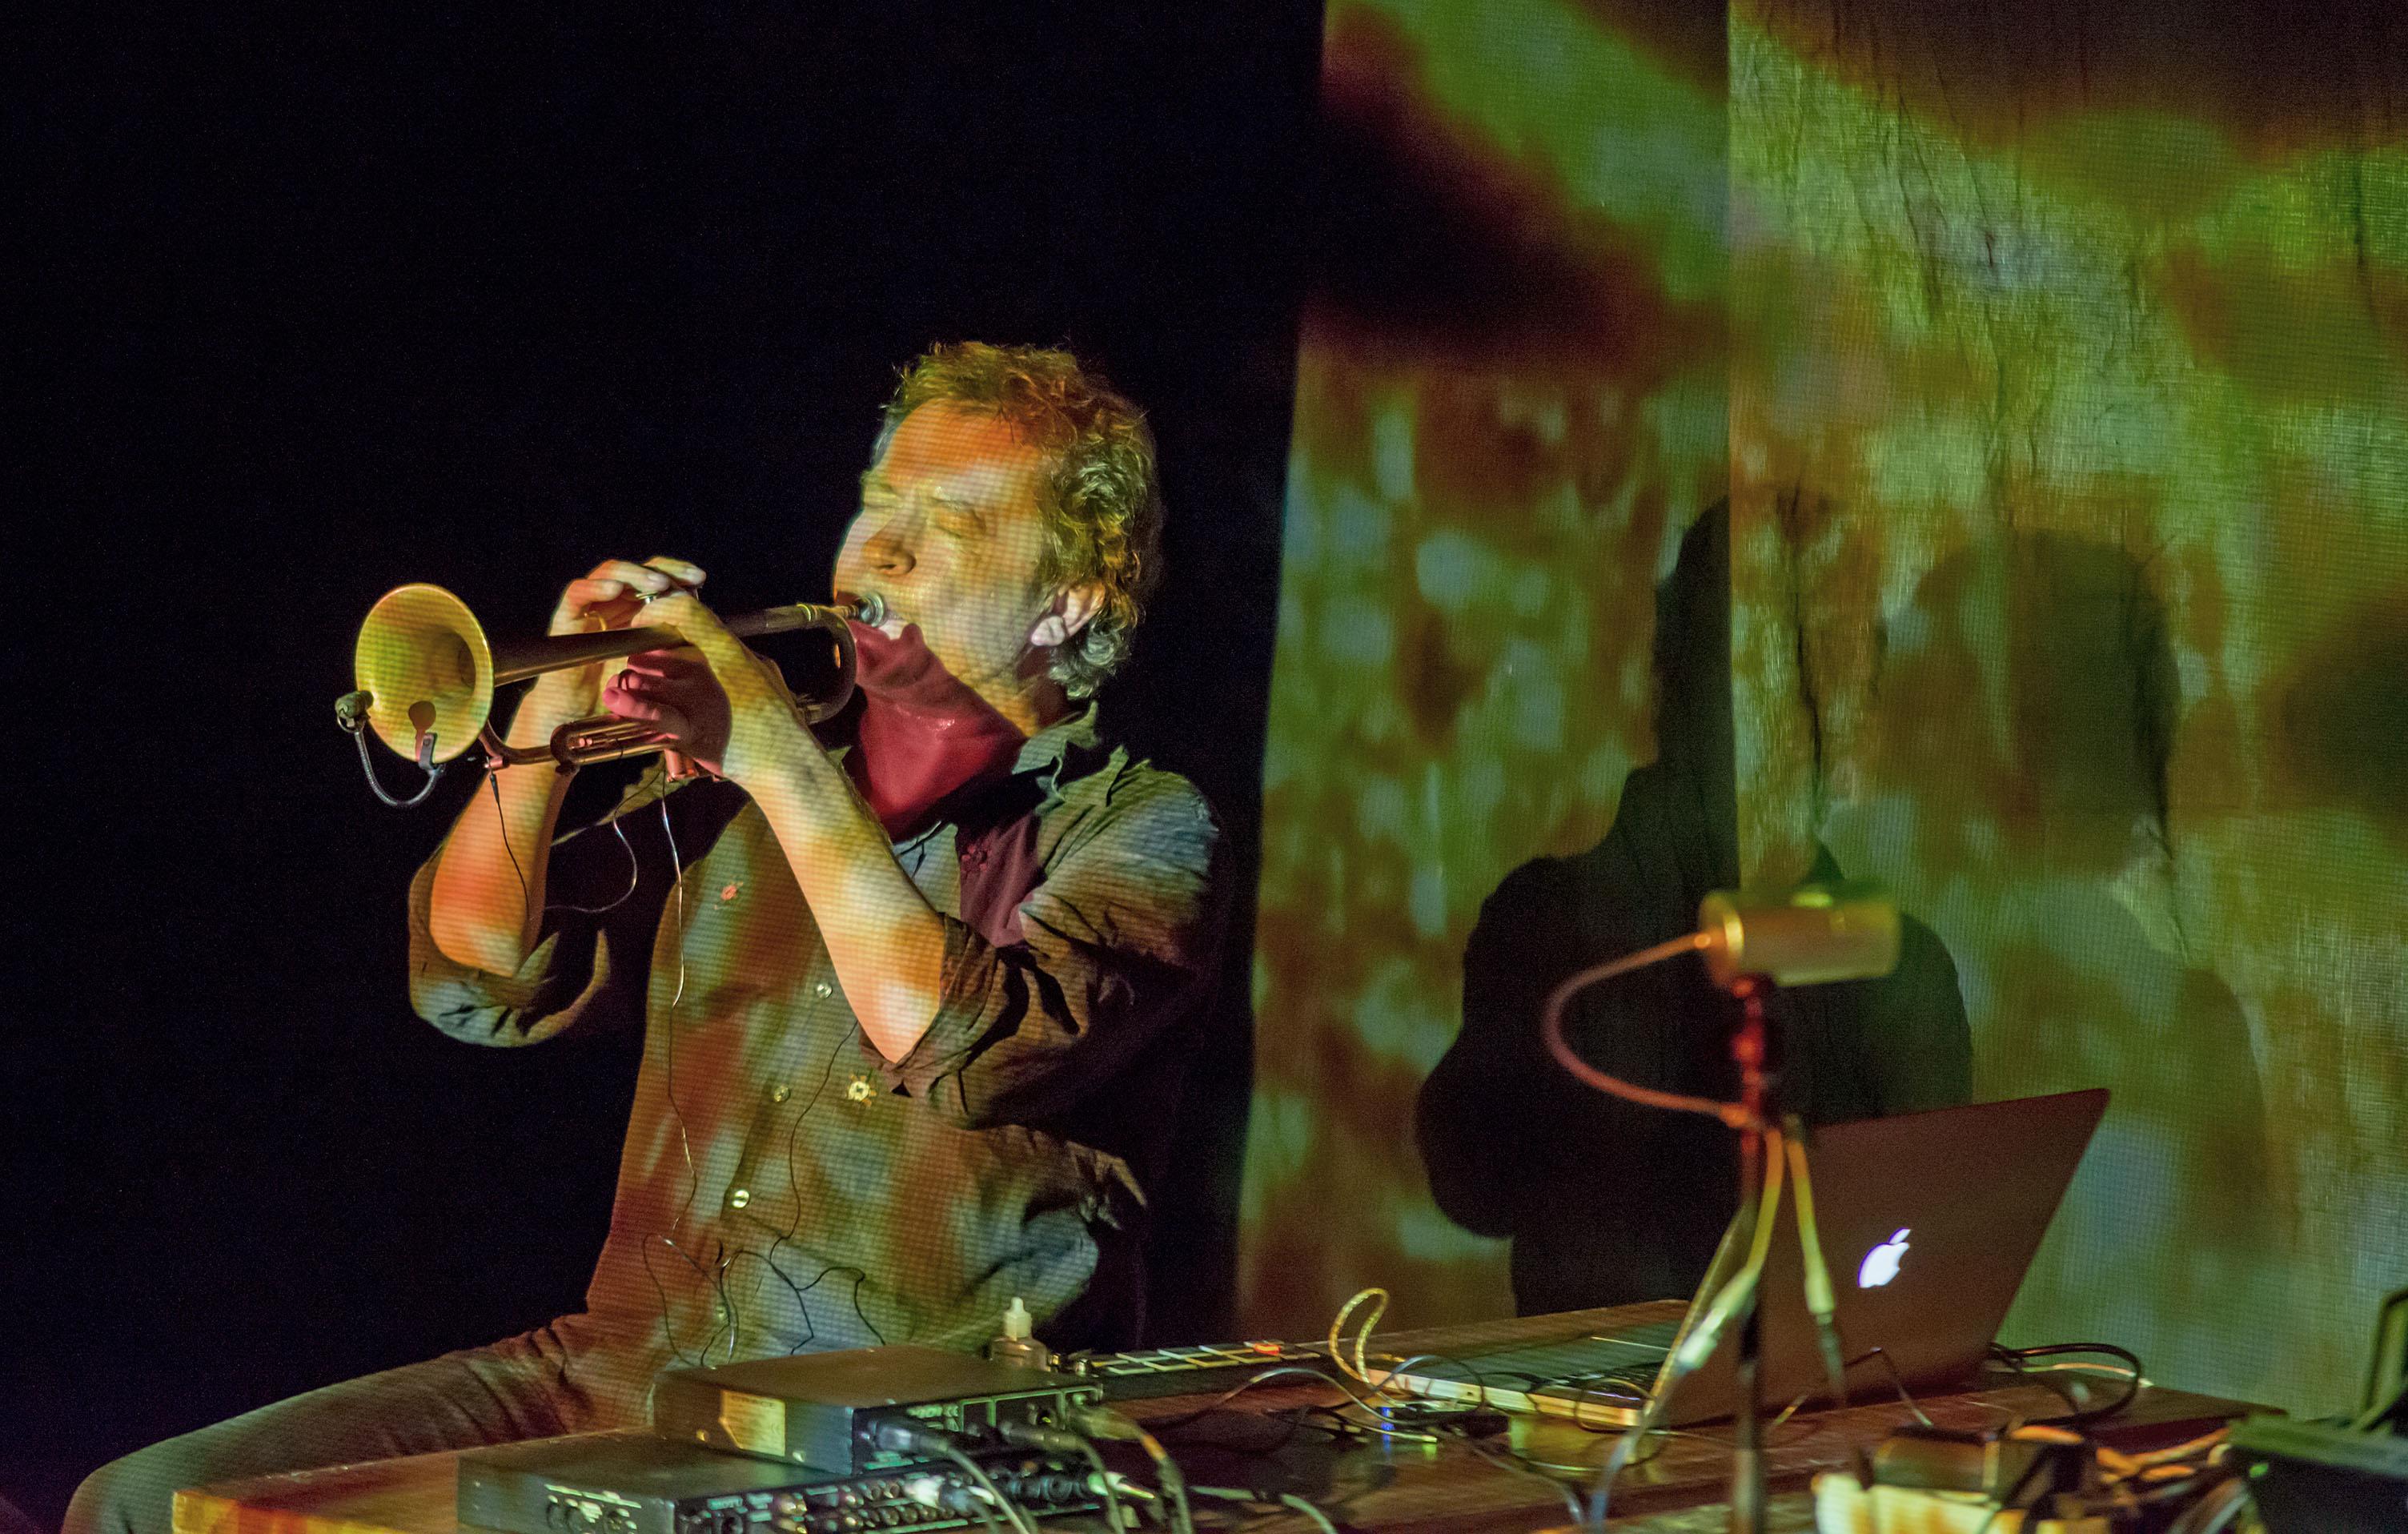 Nils petter molvaer & moritz von oswald @ punkt 2013